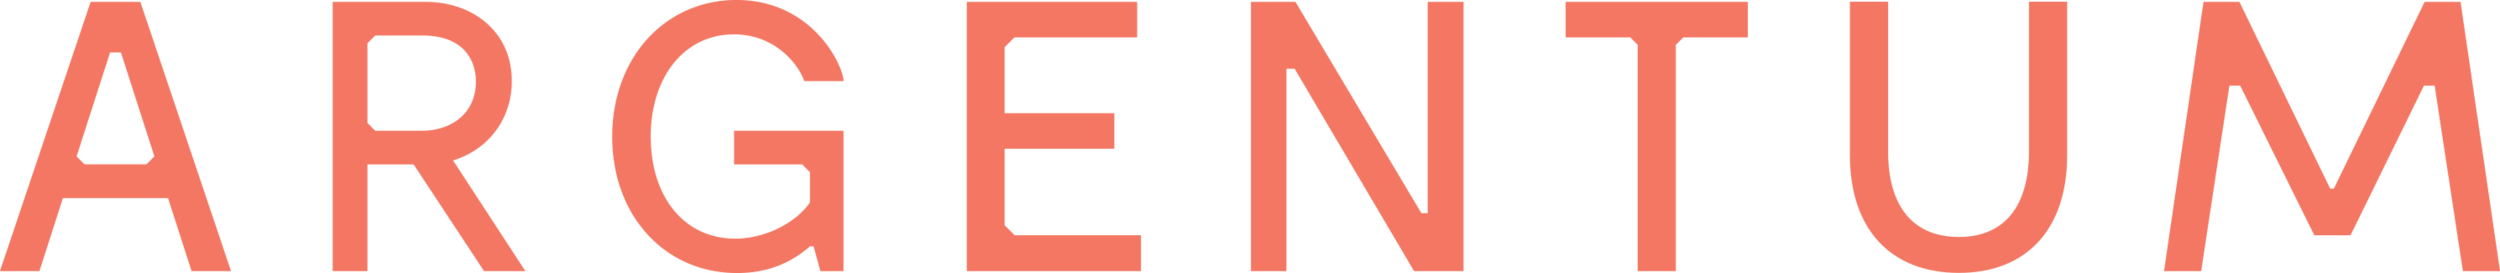 Argentum-logo-stor-org_Korall.png